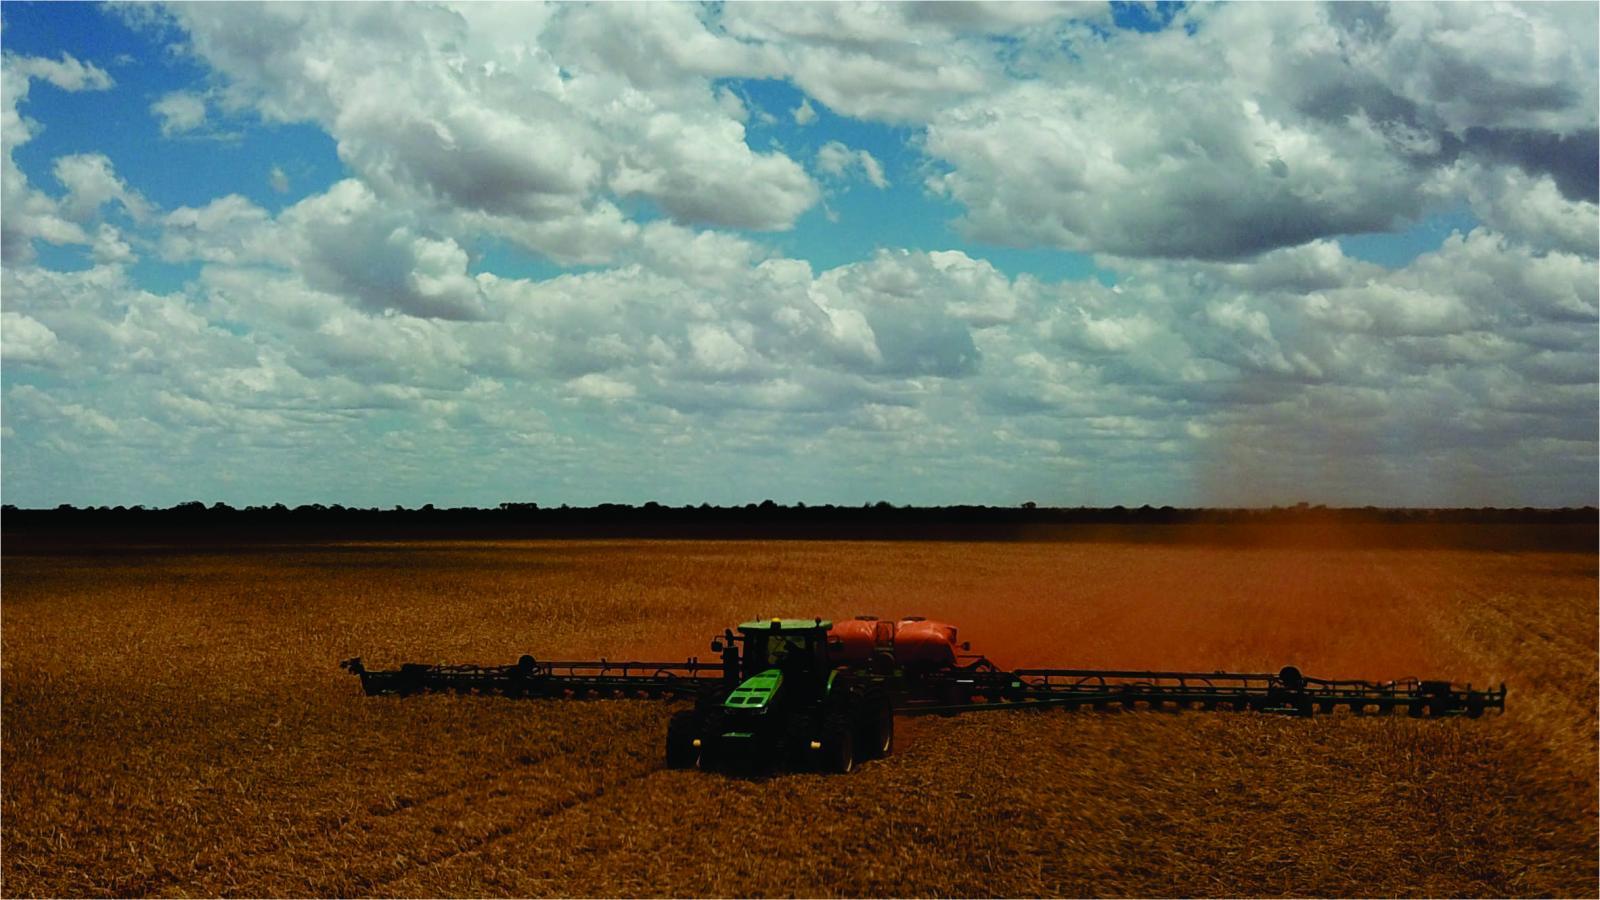 images/2018/04/carroll-farms-farmstead-45-gb1-1523484048mtuymzq4nda0oa.jpg